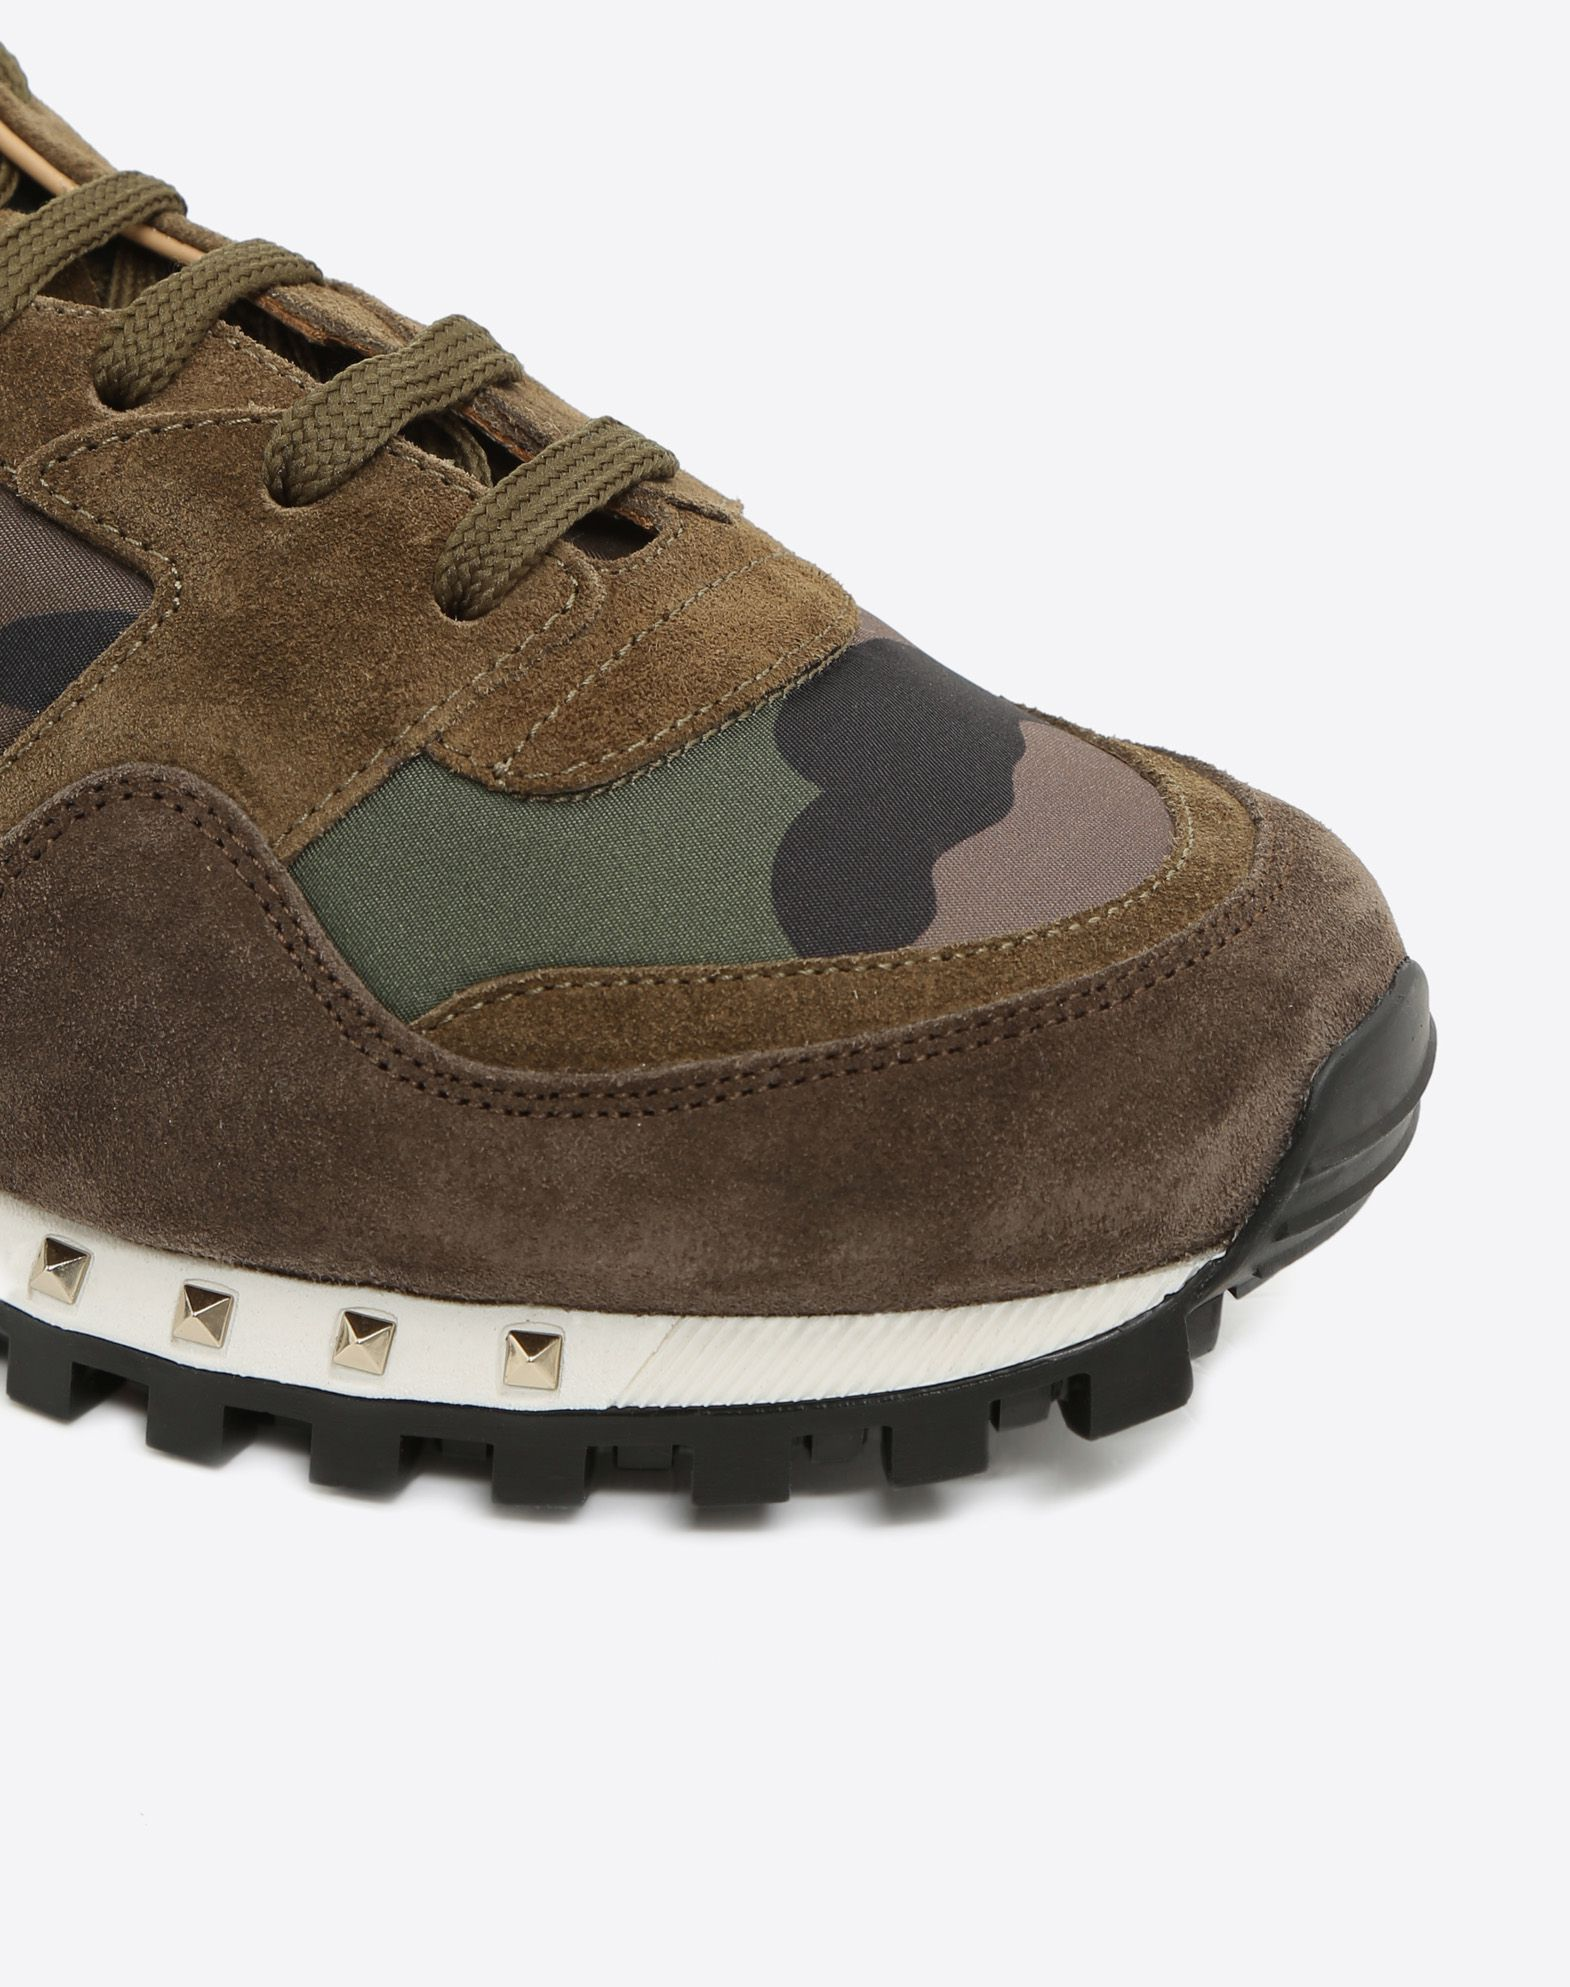 VALENTINO GARAVANI UOMO Camouflage Sneaker LOW-TOP SNEAKERS U b